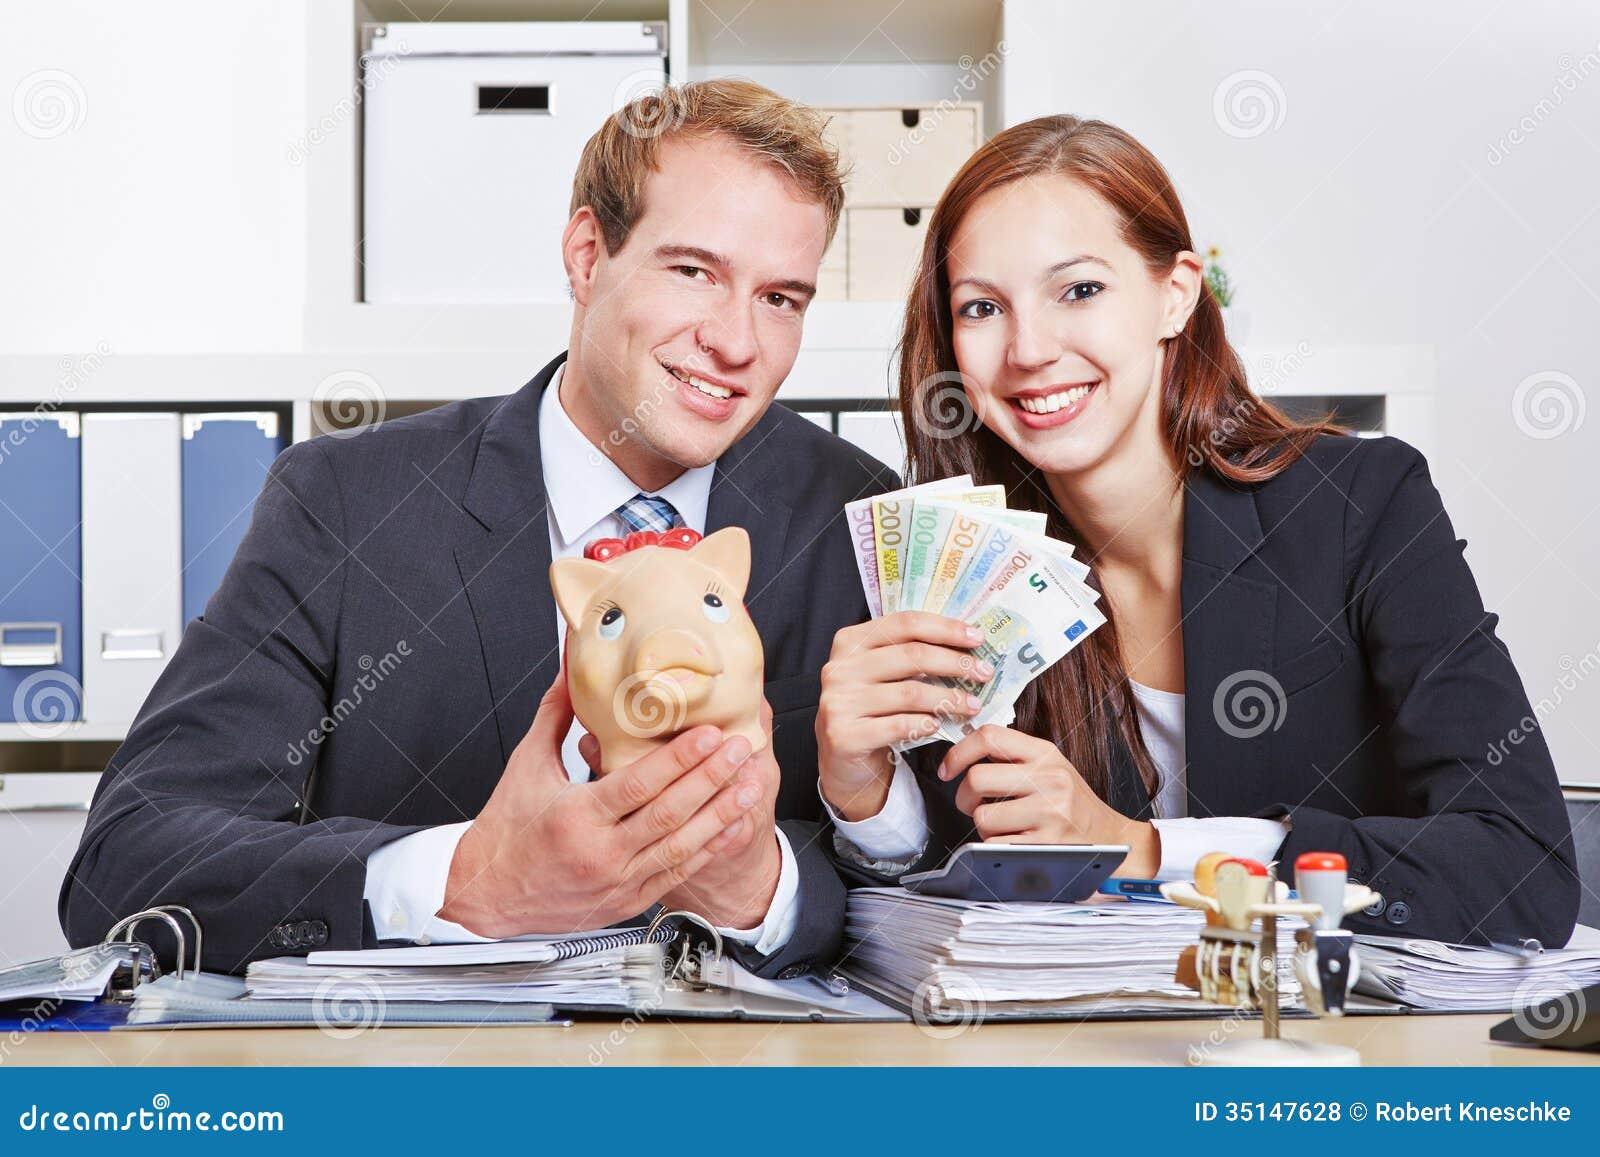 Business People With Money Stock Photo Image Of Employee